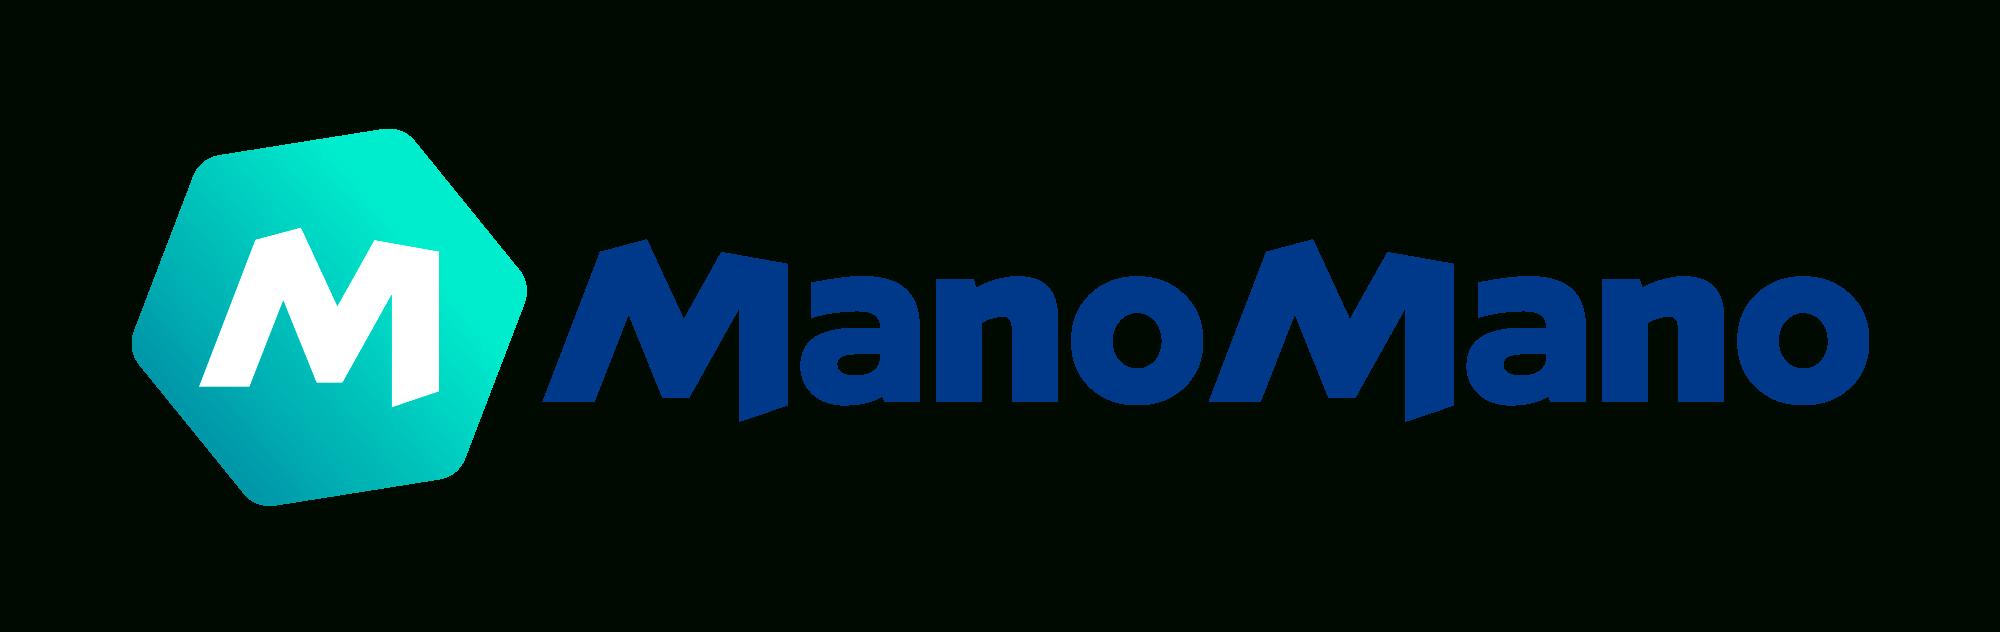 Recrutement Marchand – Manomano – Vendre Sur Manomano dedans Manomano Piscine